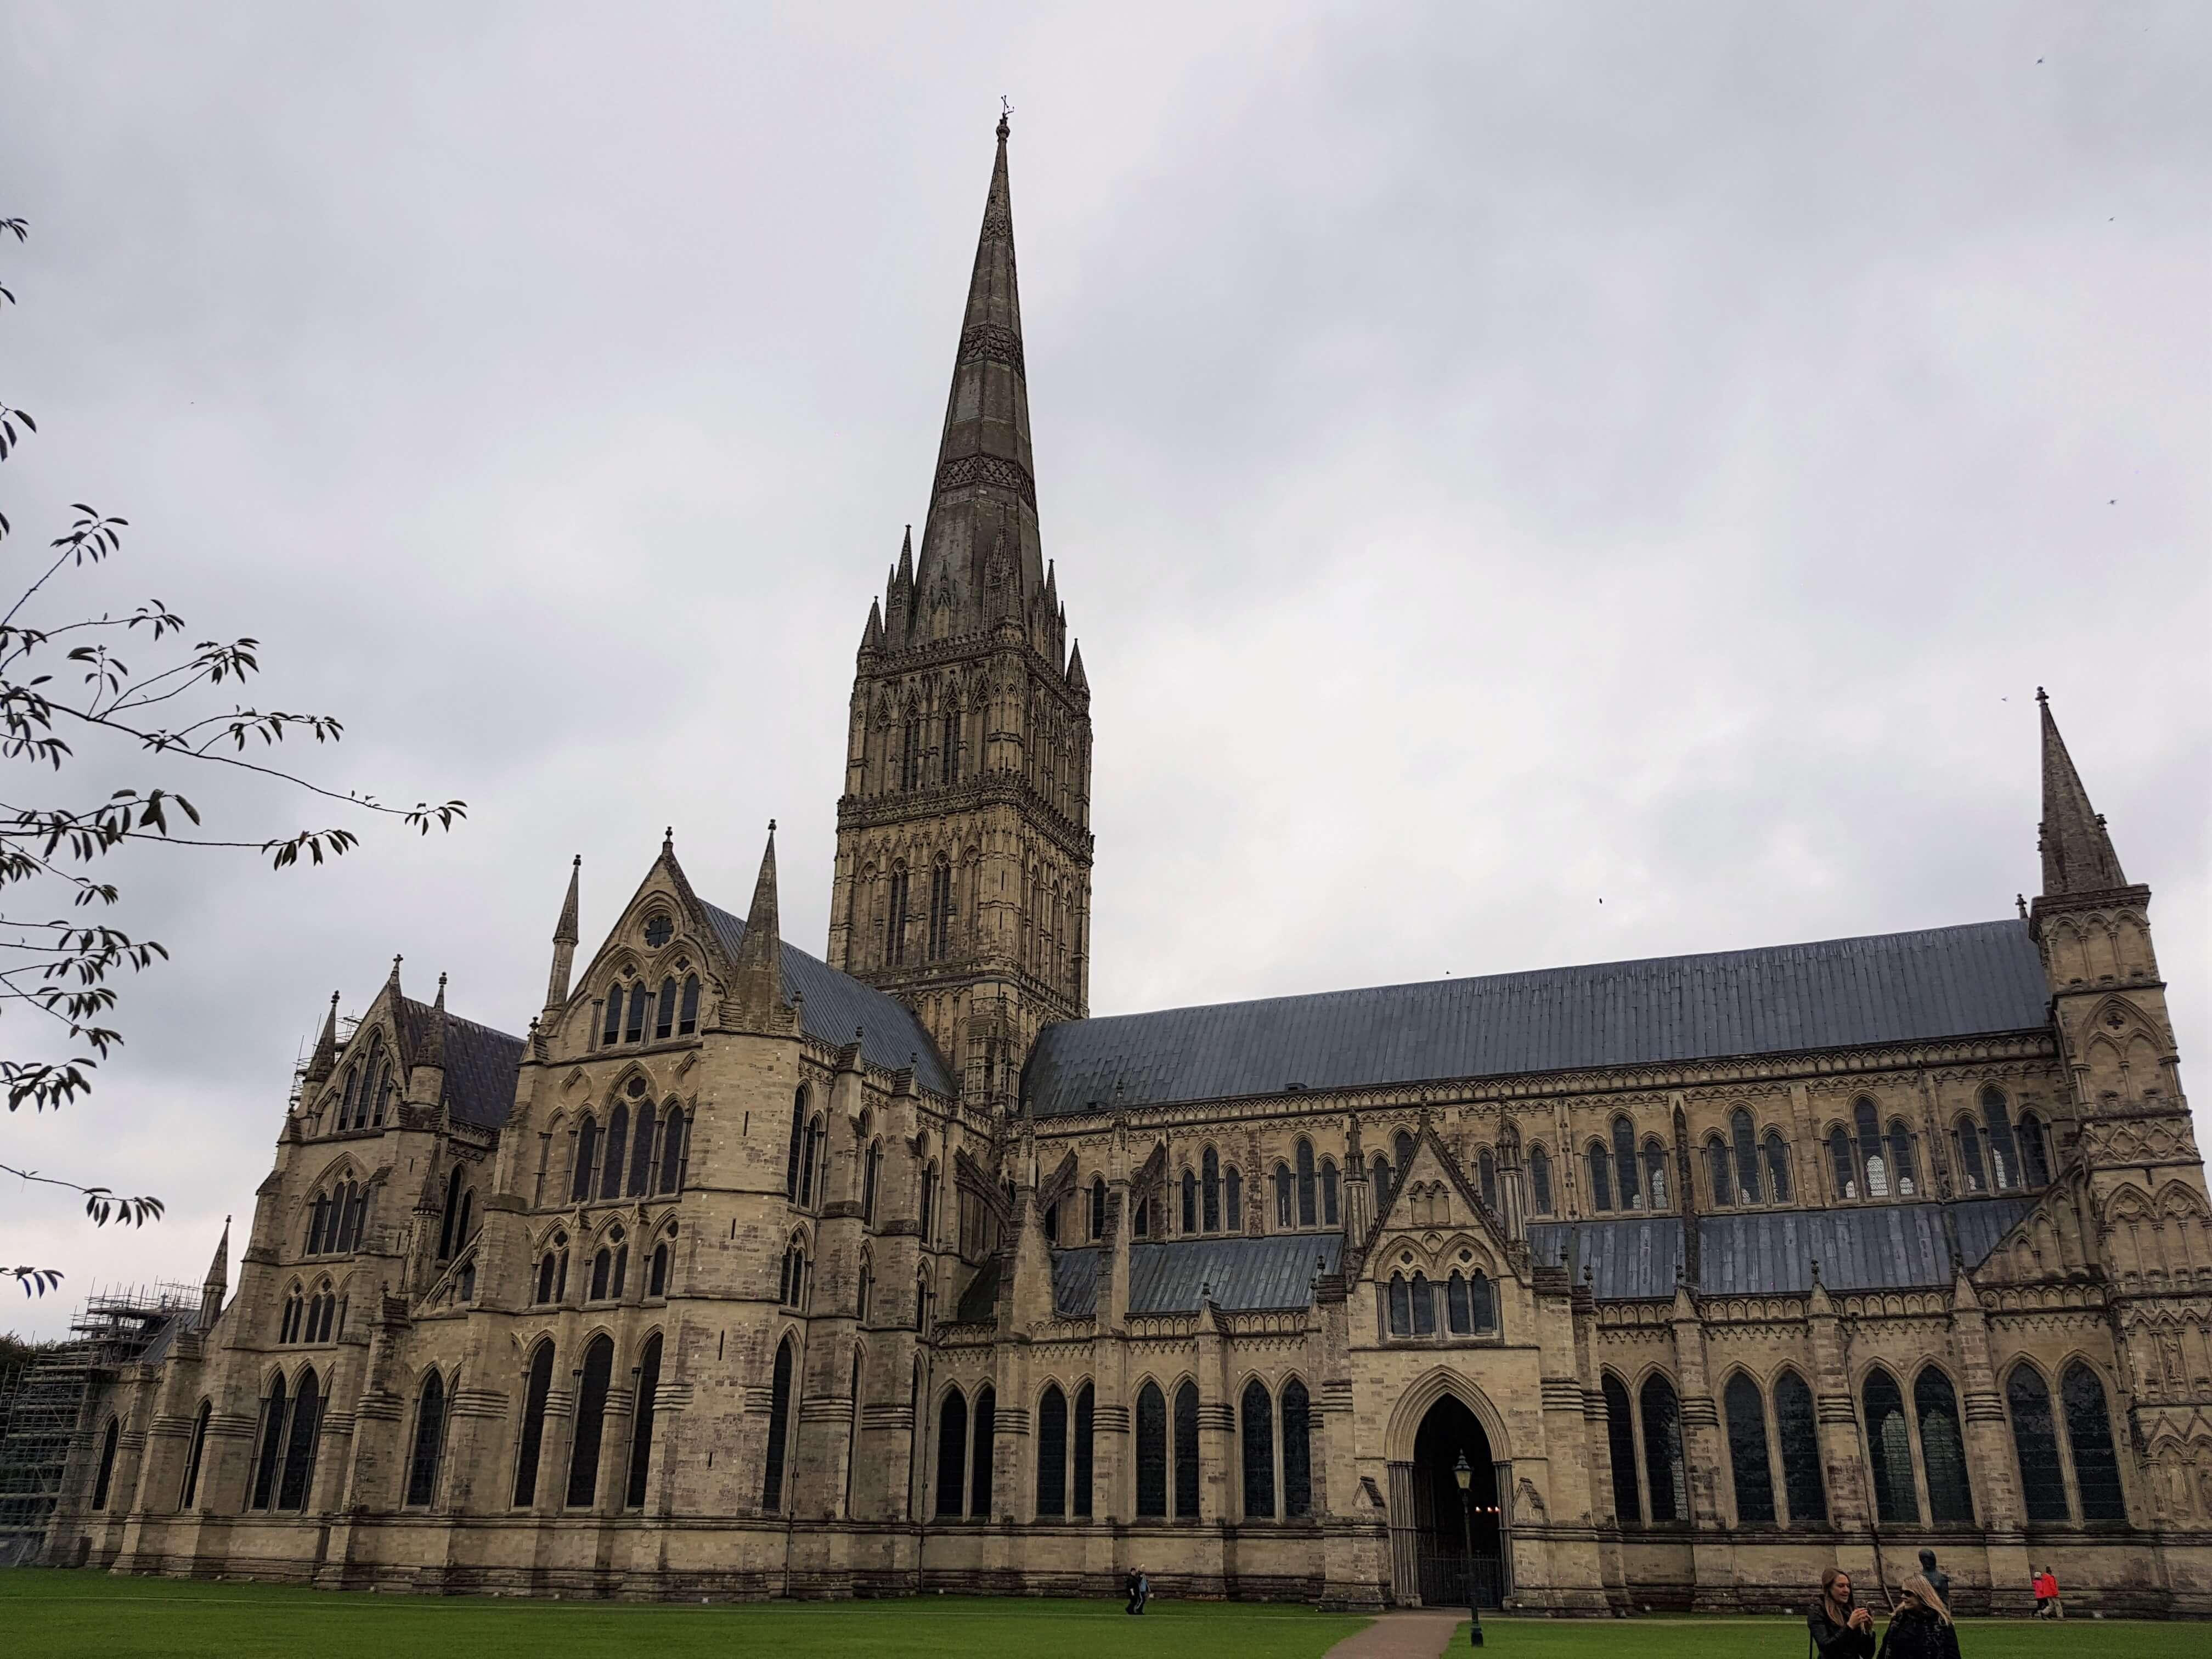 Salisbury Cathedral, England 2019.